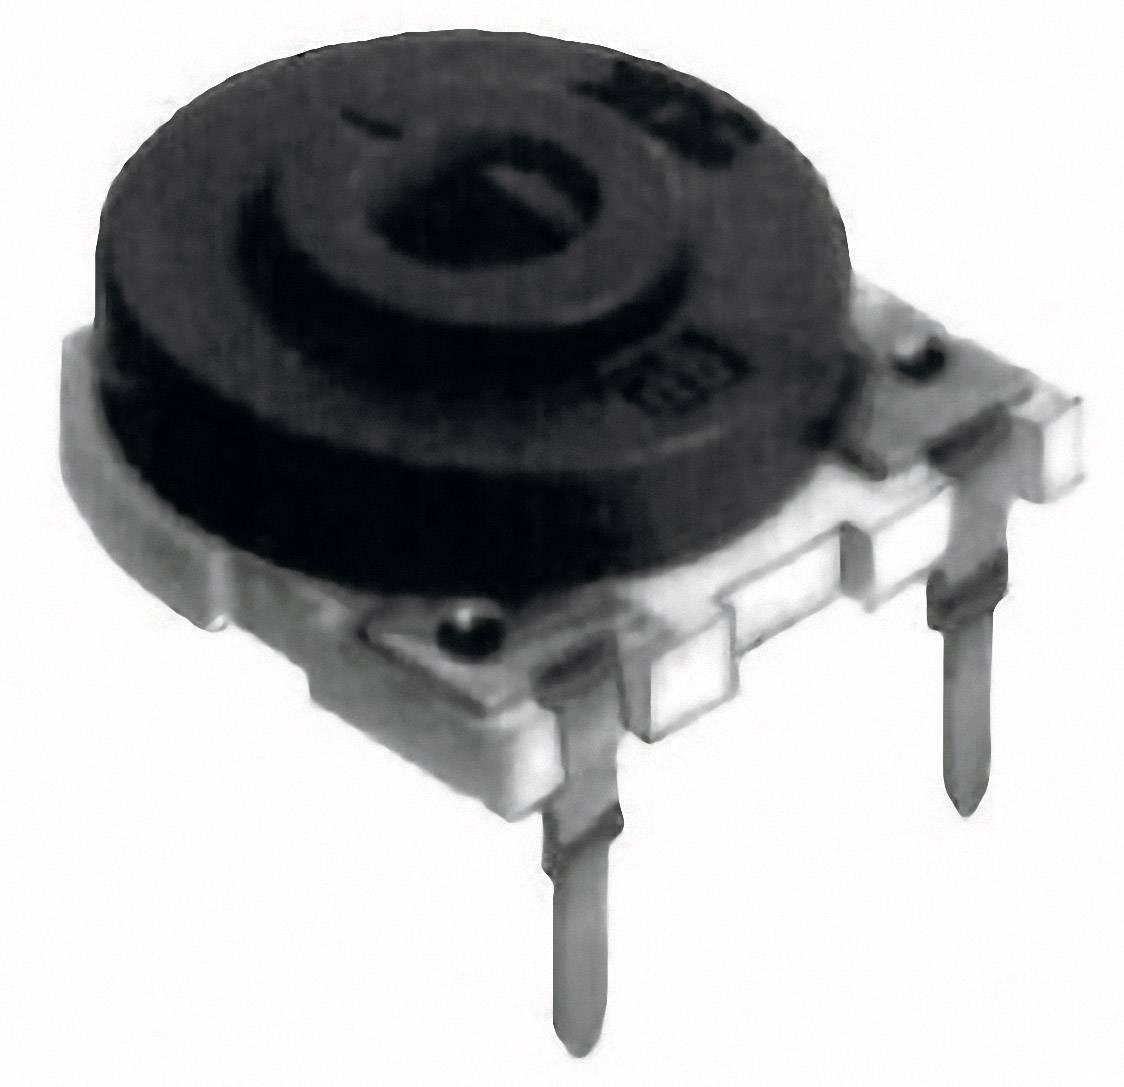 Cermetový trimer TT Electro, 2041462305, 220 kΩ, 0.5 W, ± 20%